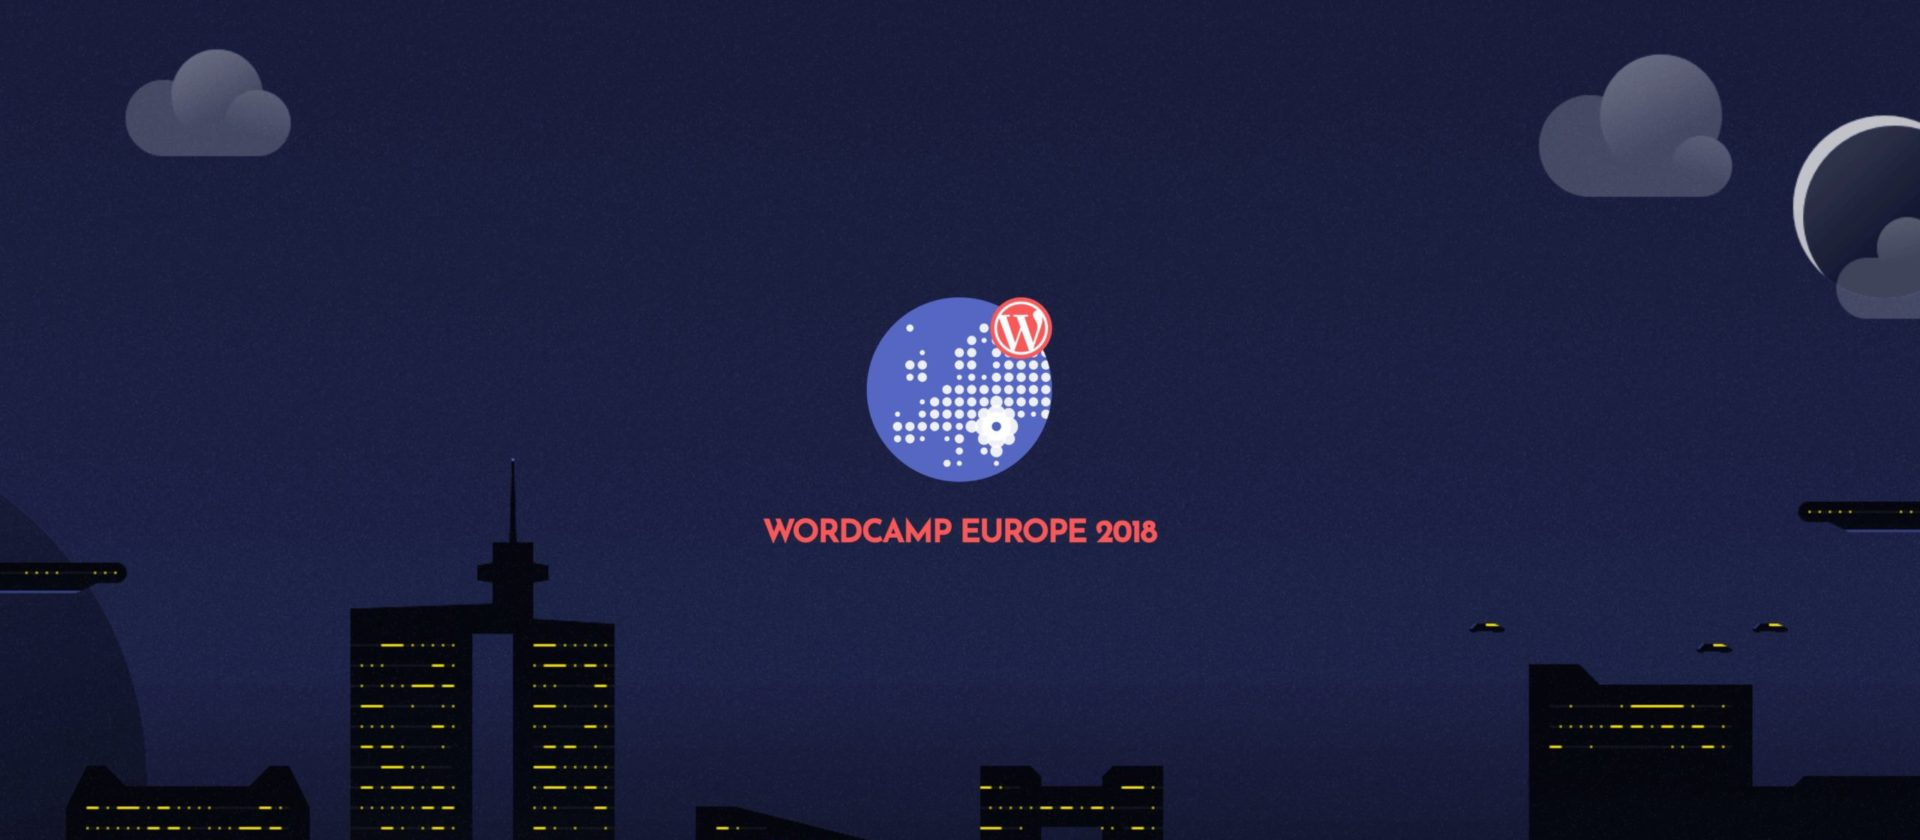 WordCamp Europe Erfahrung auf dem WCEU 2018 in Belgrad